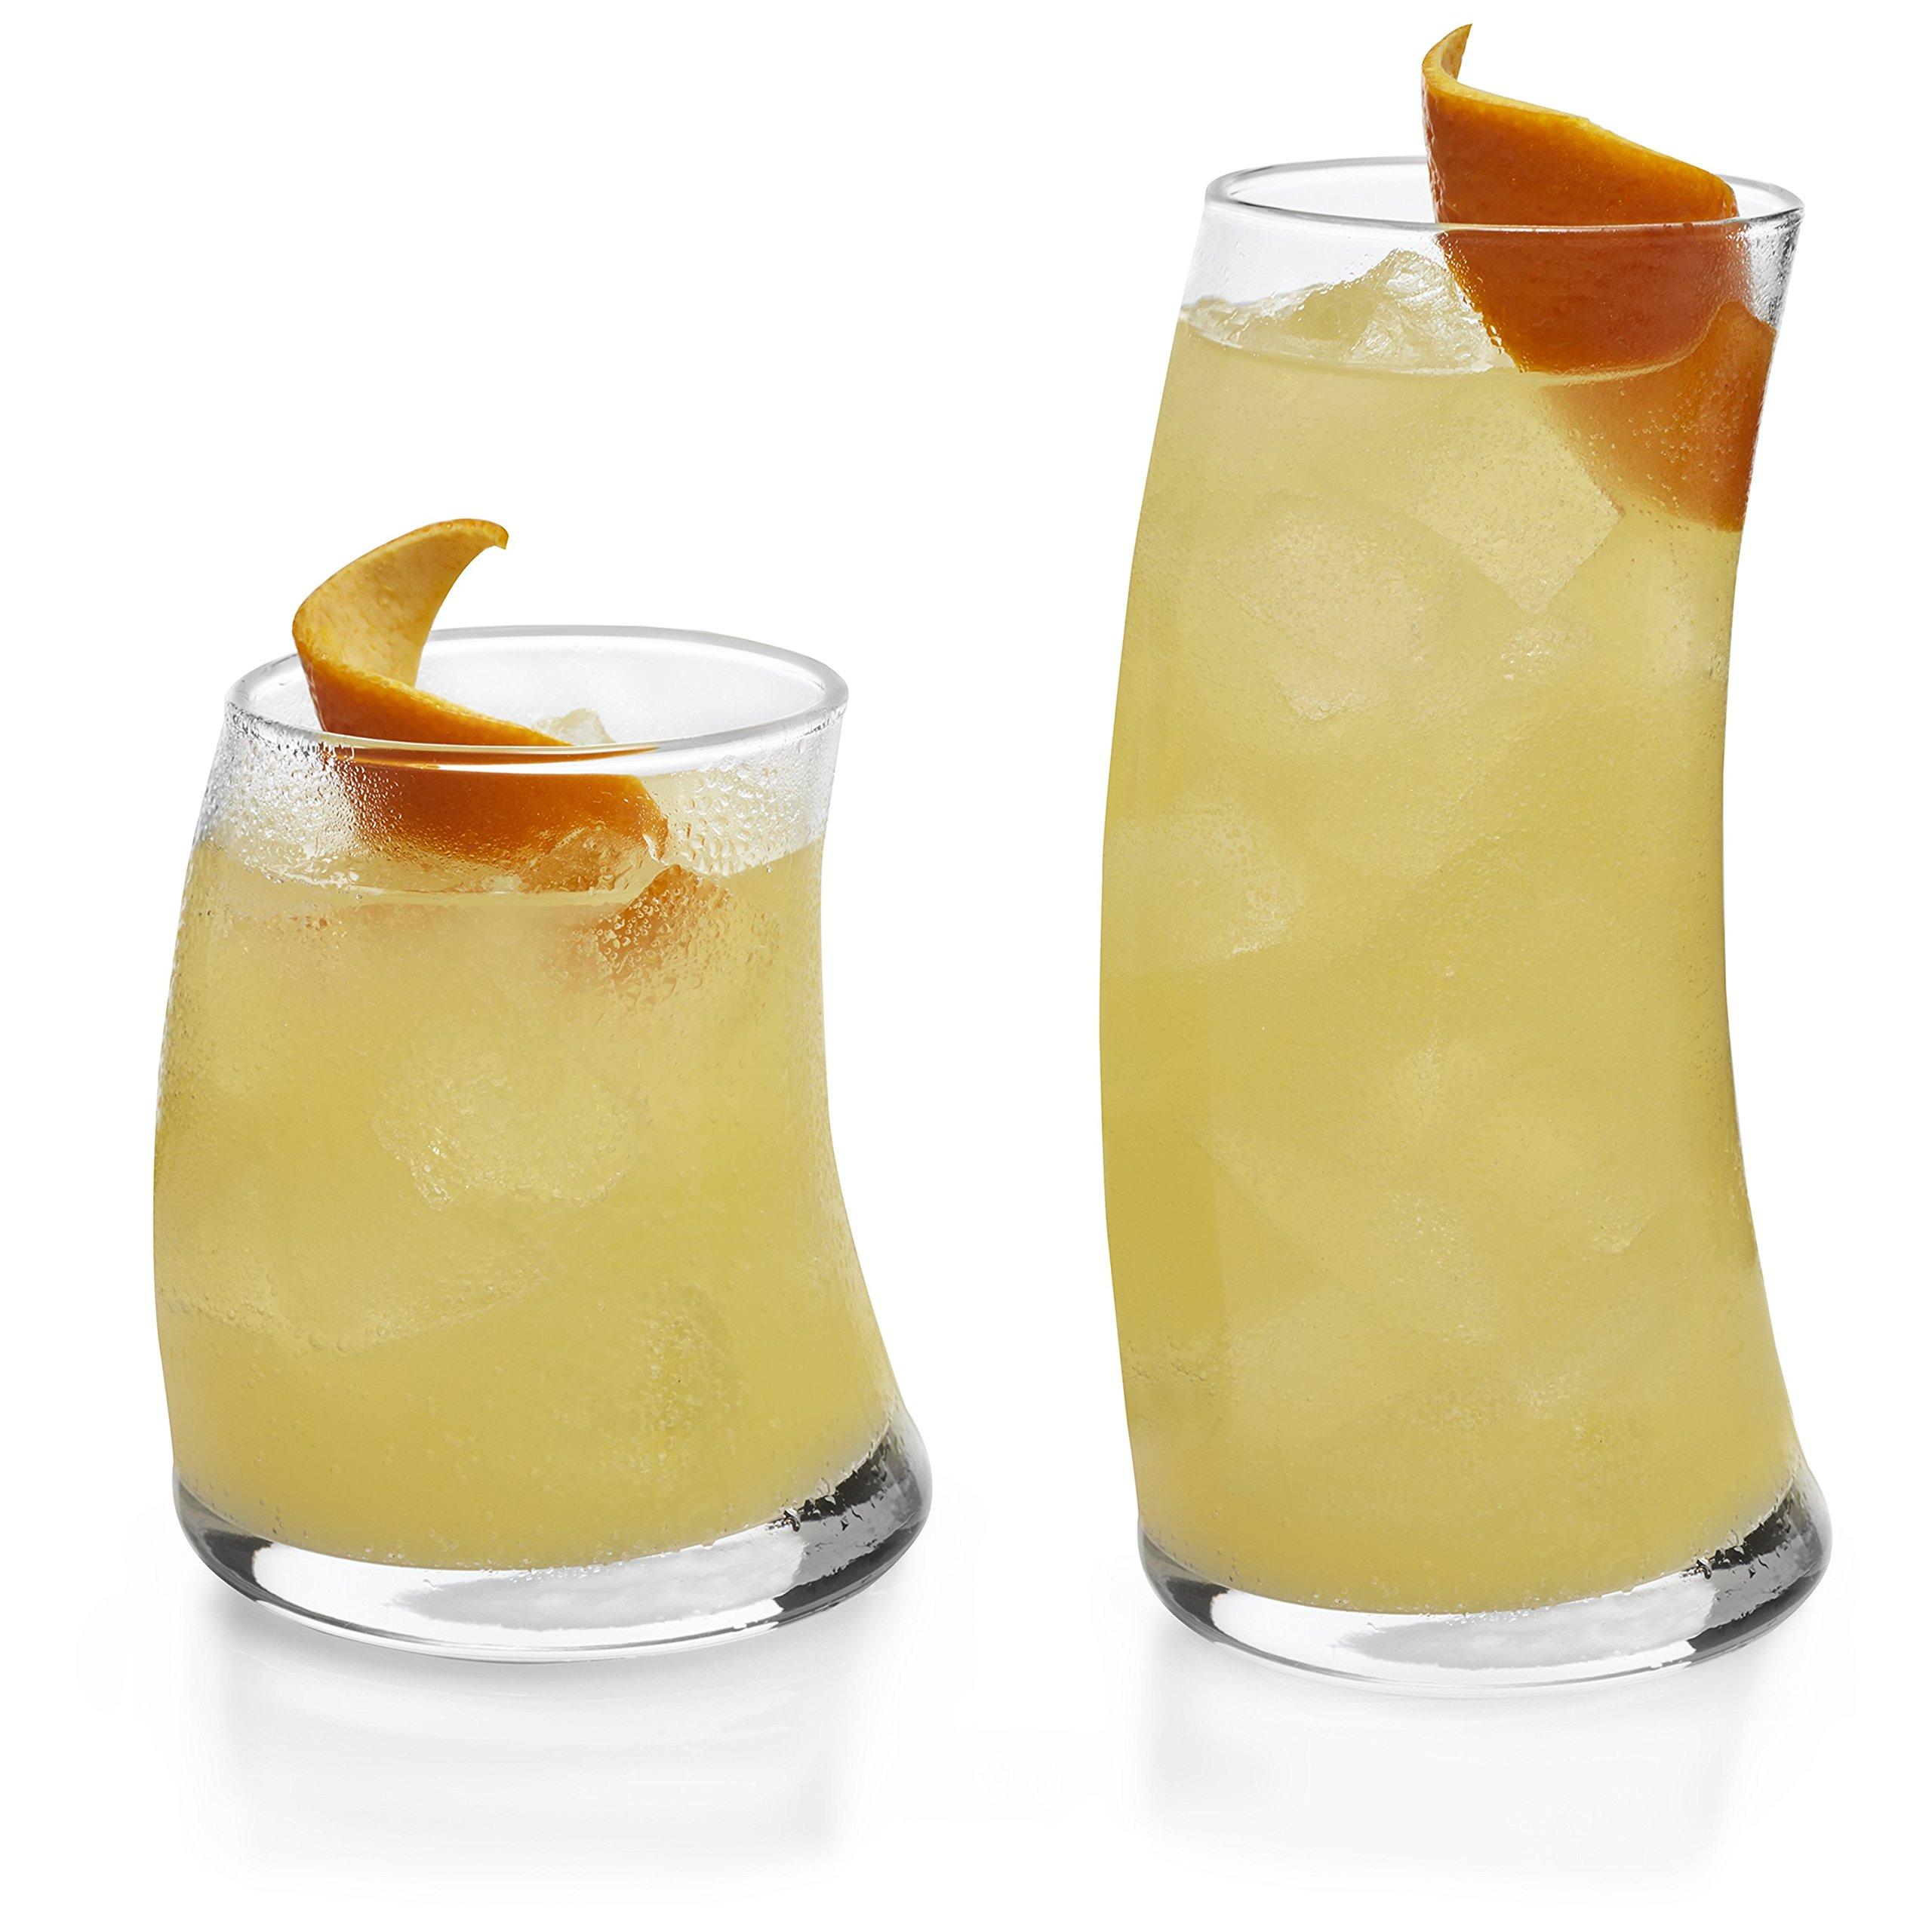 Libbey Swerve 16-piece Drinkware Glass Set